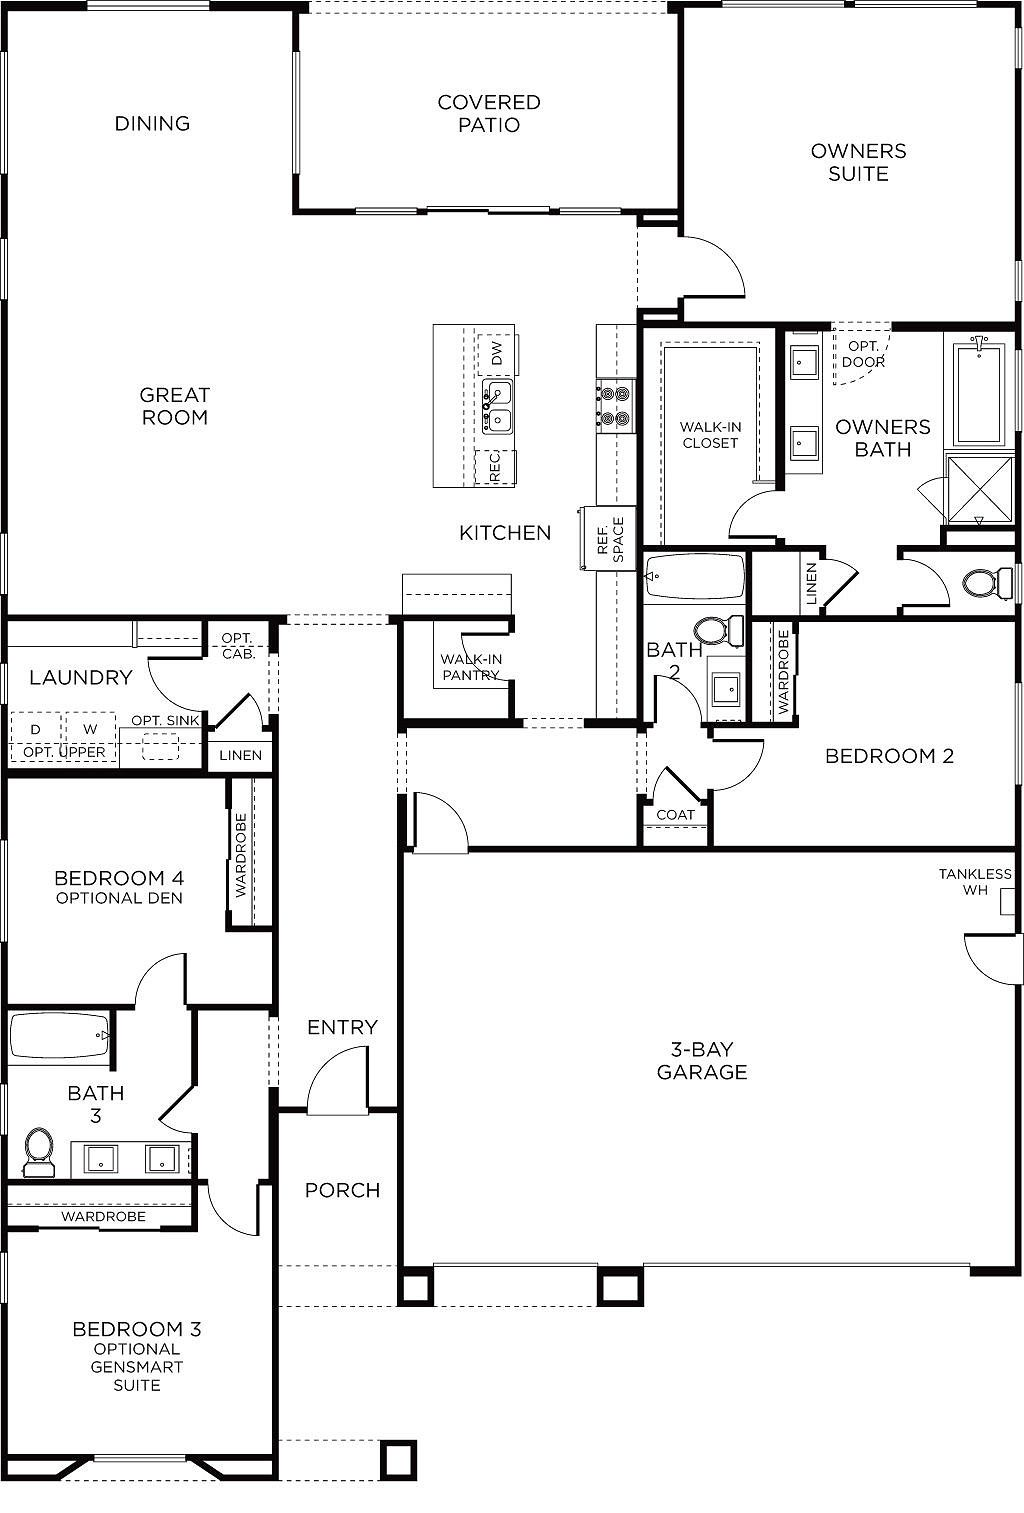 Abrio Plan 1 Floorplan | 5 bedroom house plans, Manufactured ... on ranch log homes, townhouse plans, 3 car garage plans, summer cottage plans, log cabin plans, ranch luxury homes, strip mall plans, ranch modular homes, ranch art, ranch style homes, ranch backyard, floor plans,